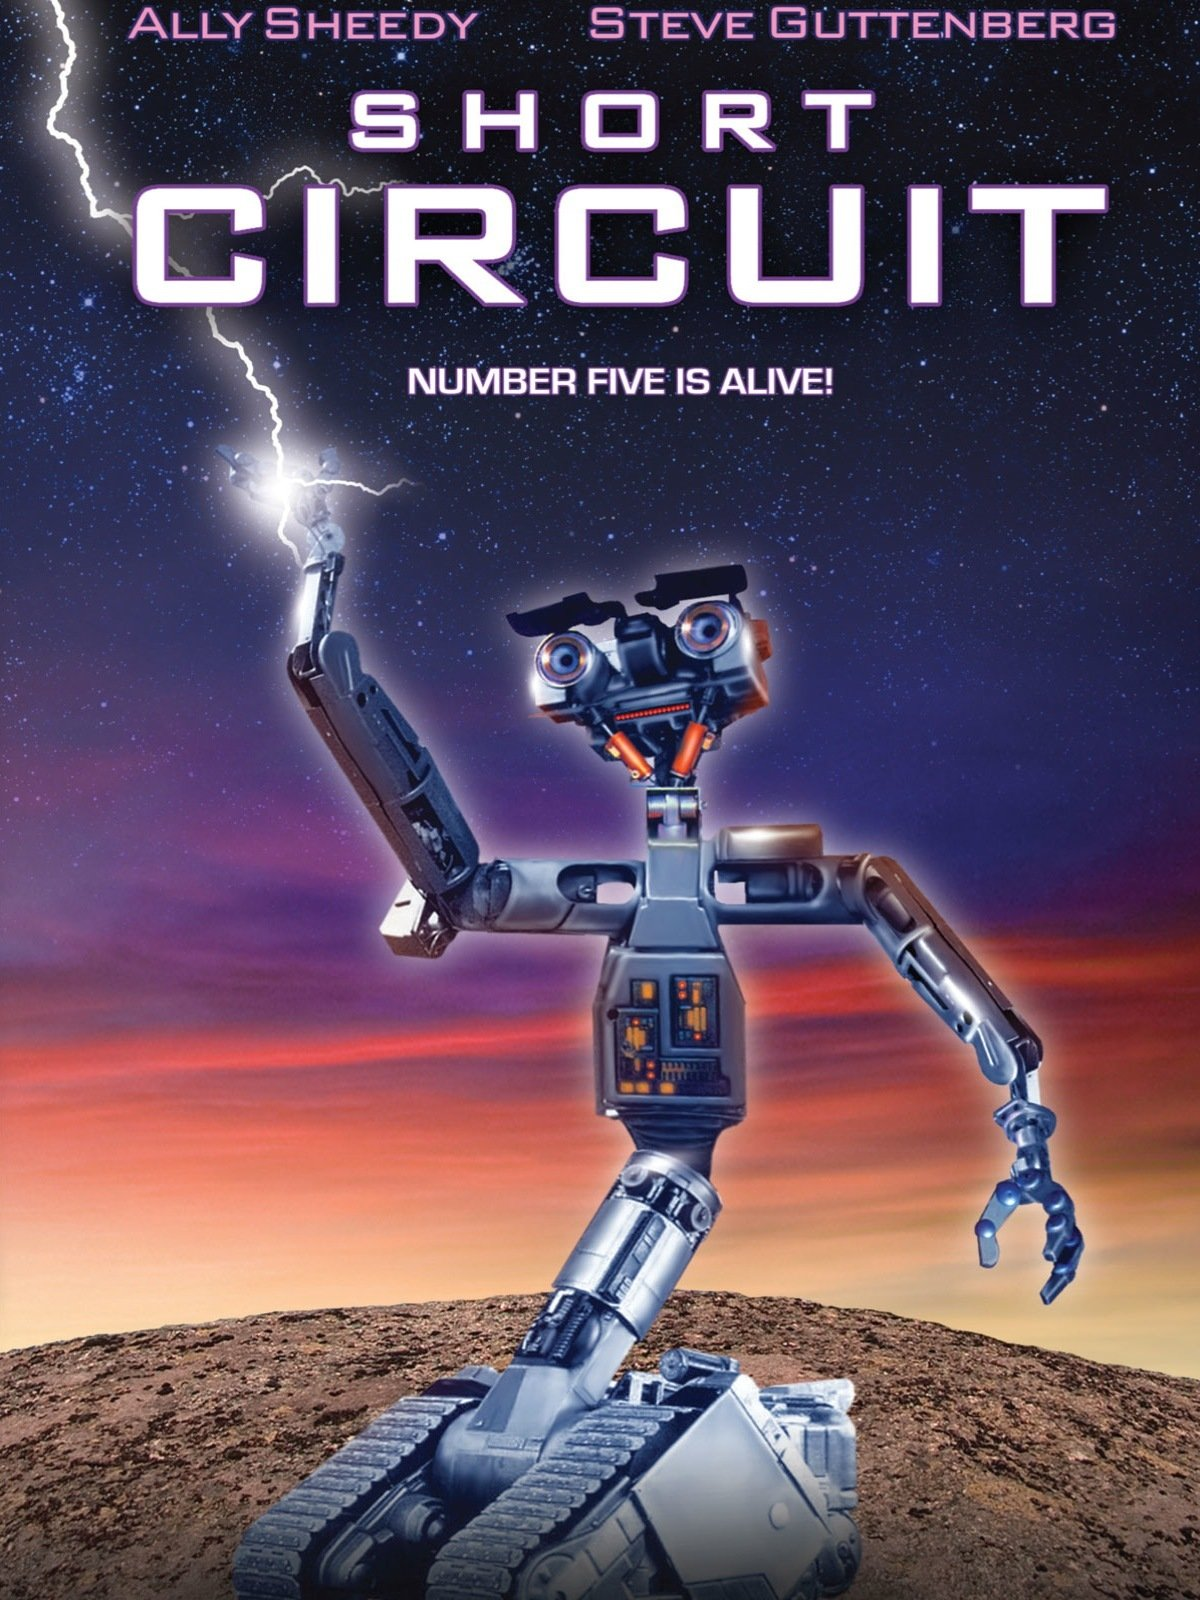 Johnny Five Short Circuit Image